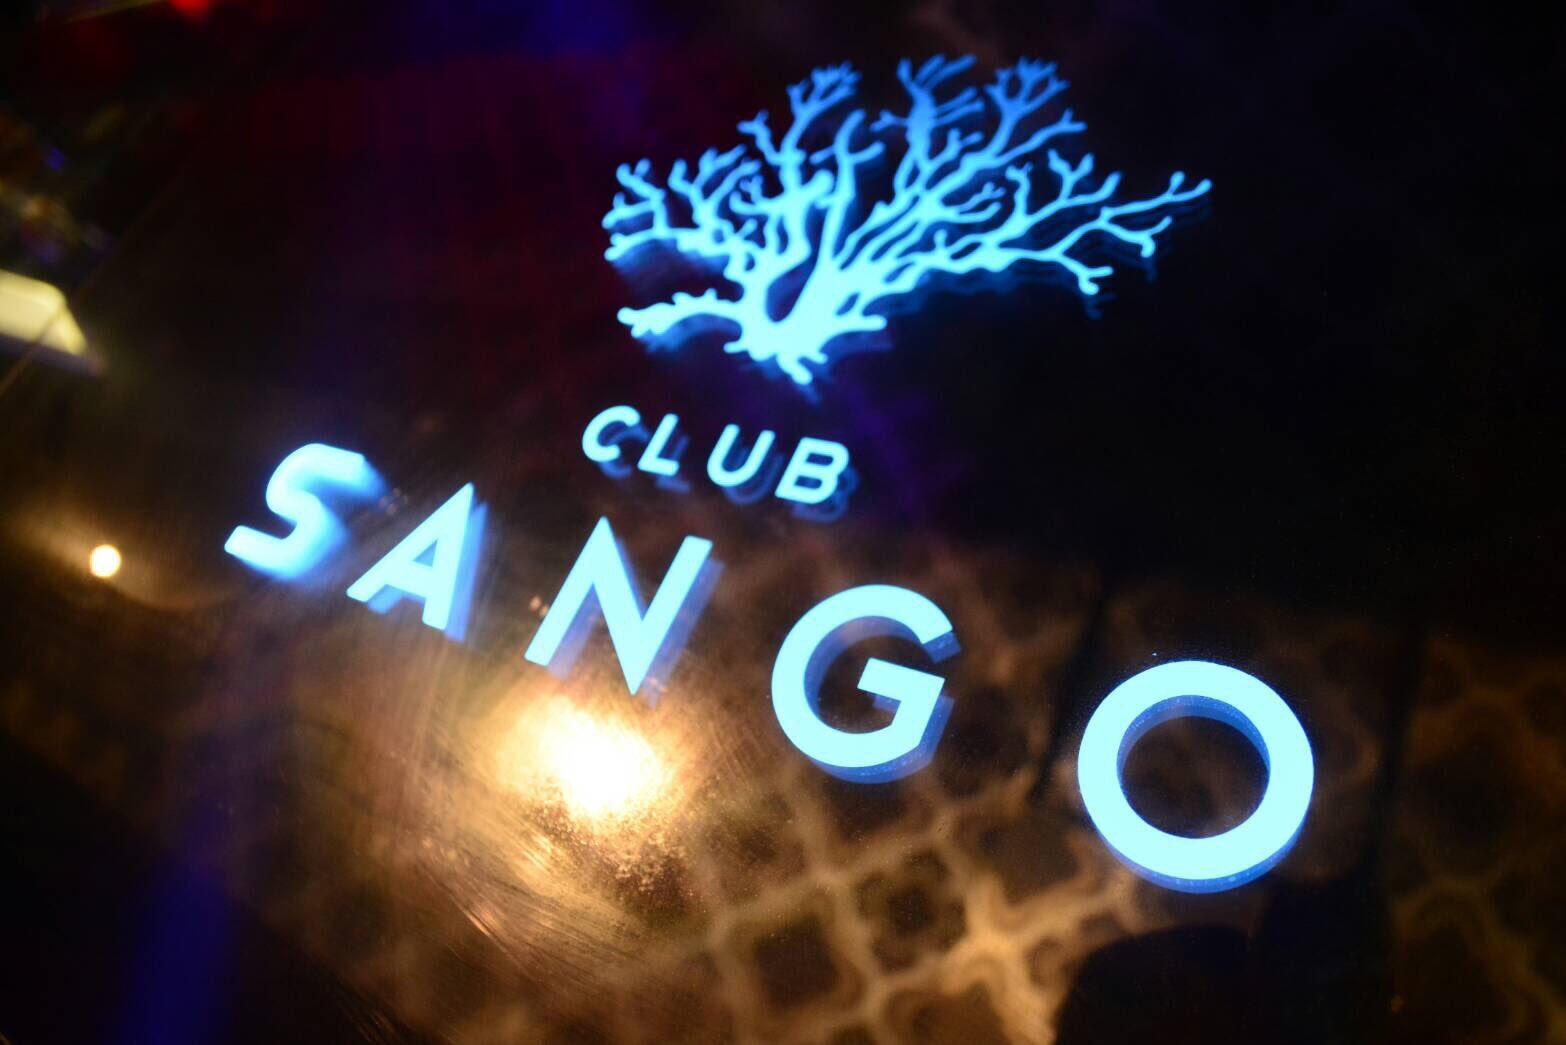 CLUB SANGO3